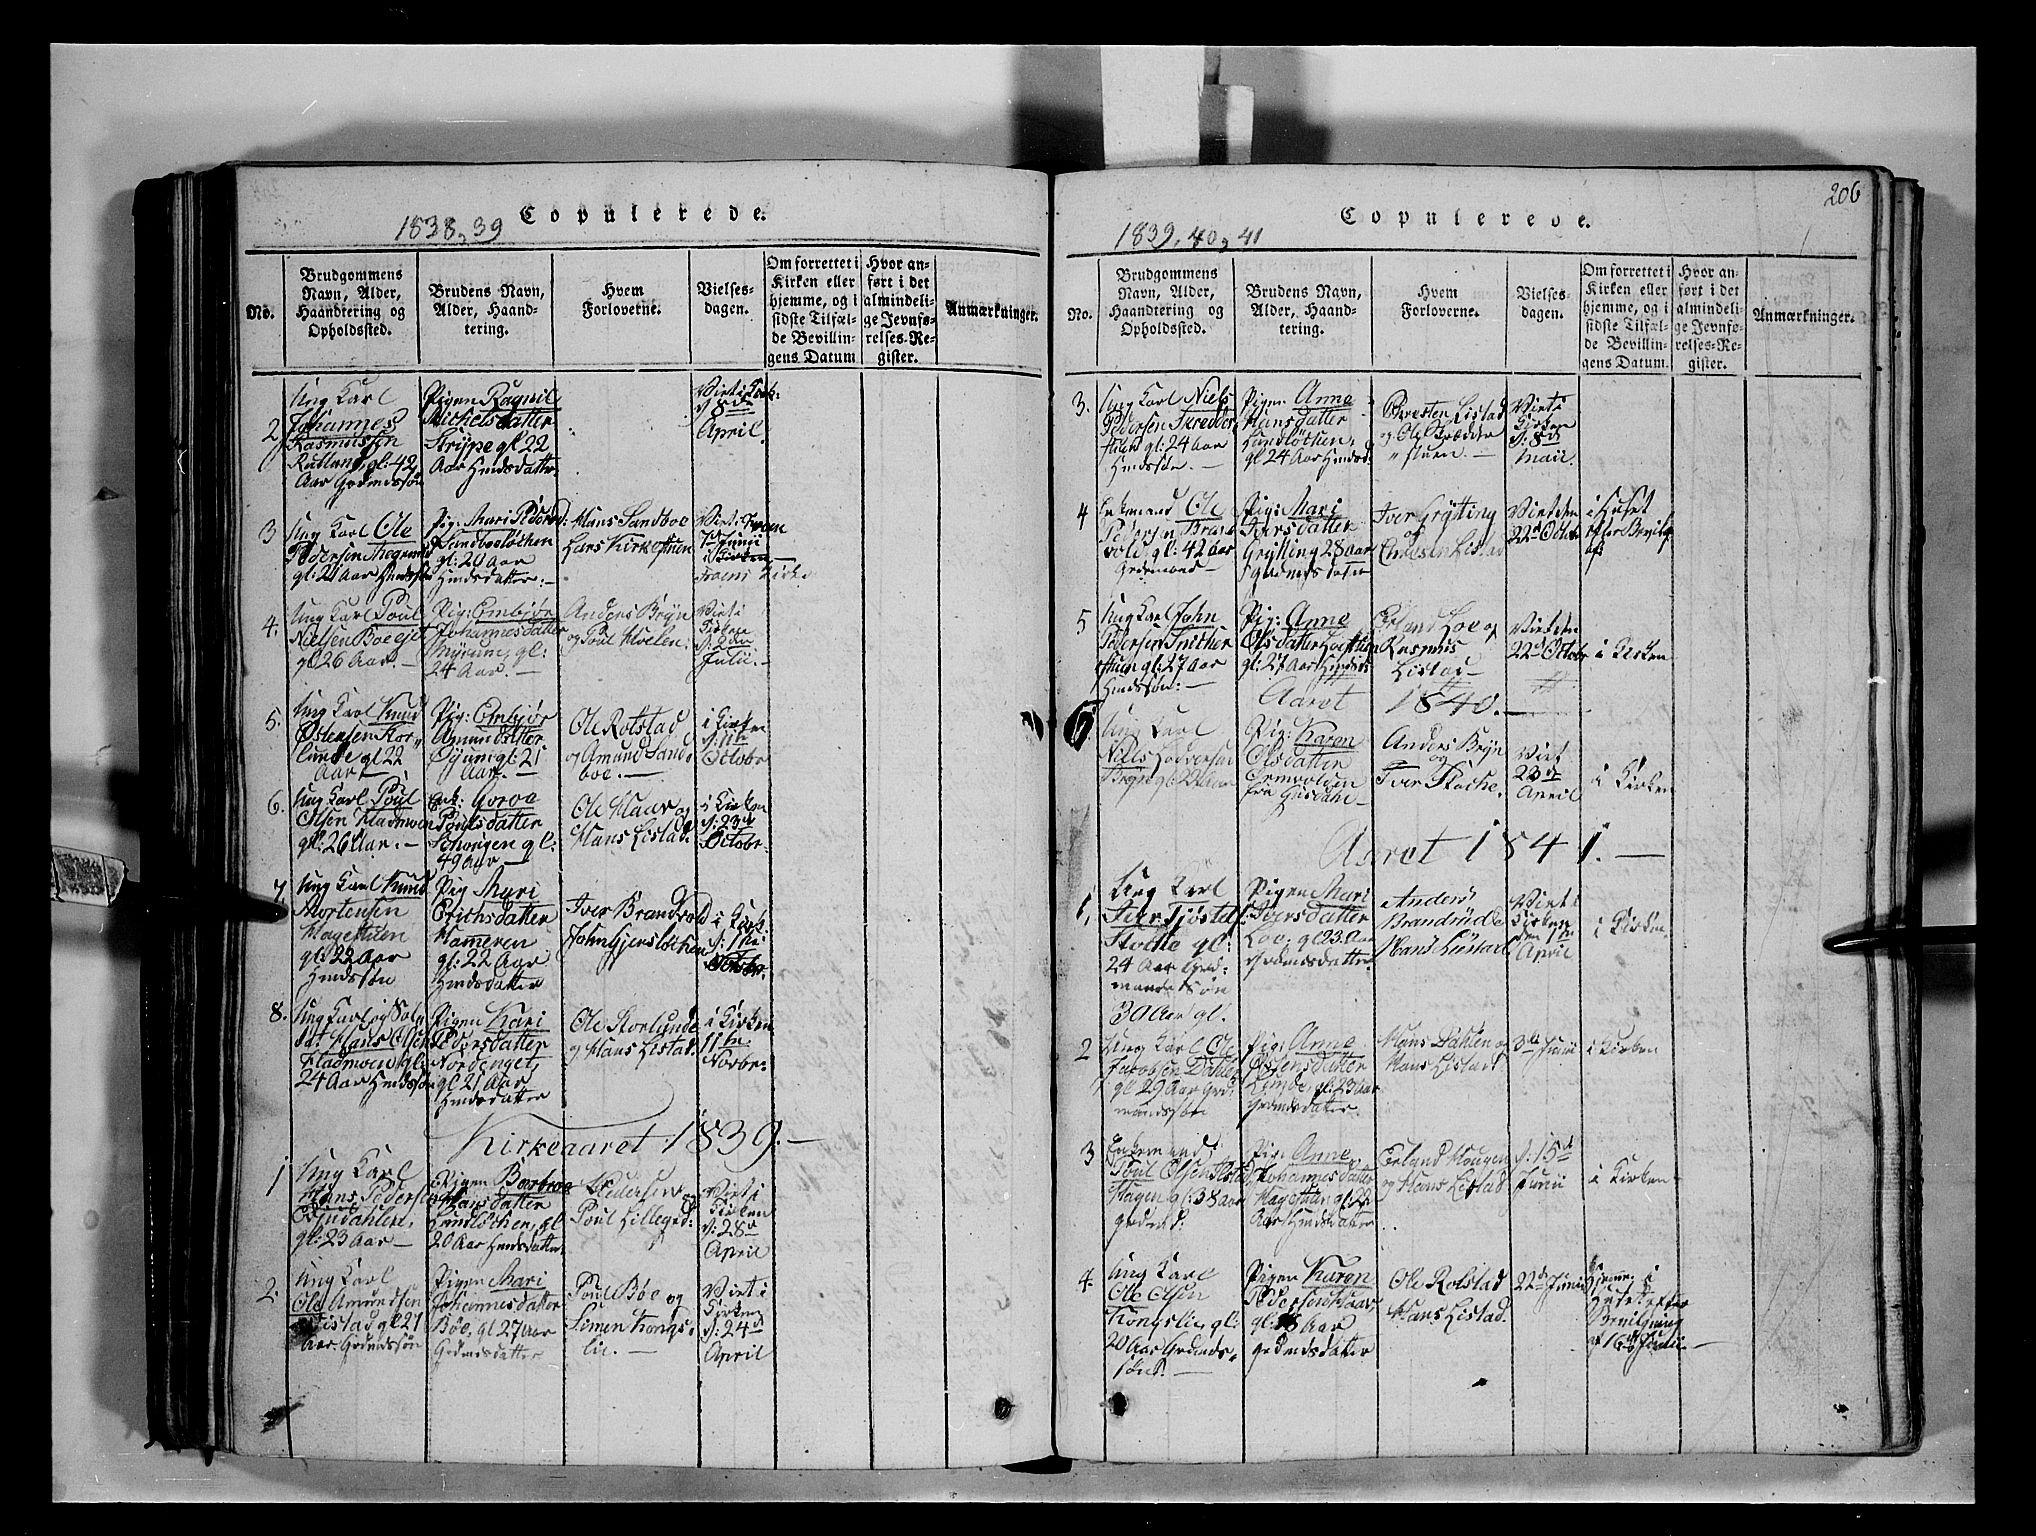 SAH, Fron prestekontor, H/Ha/Hab/L0004: Klokkerbok nr. 4, 1816-1850, s. 206